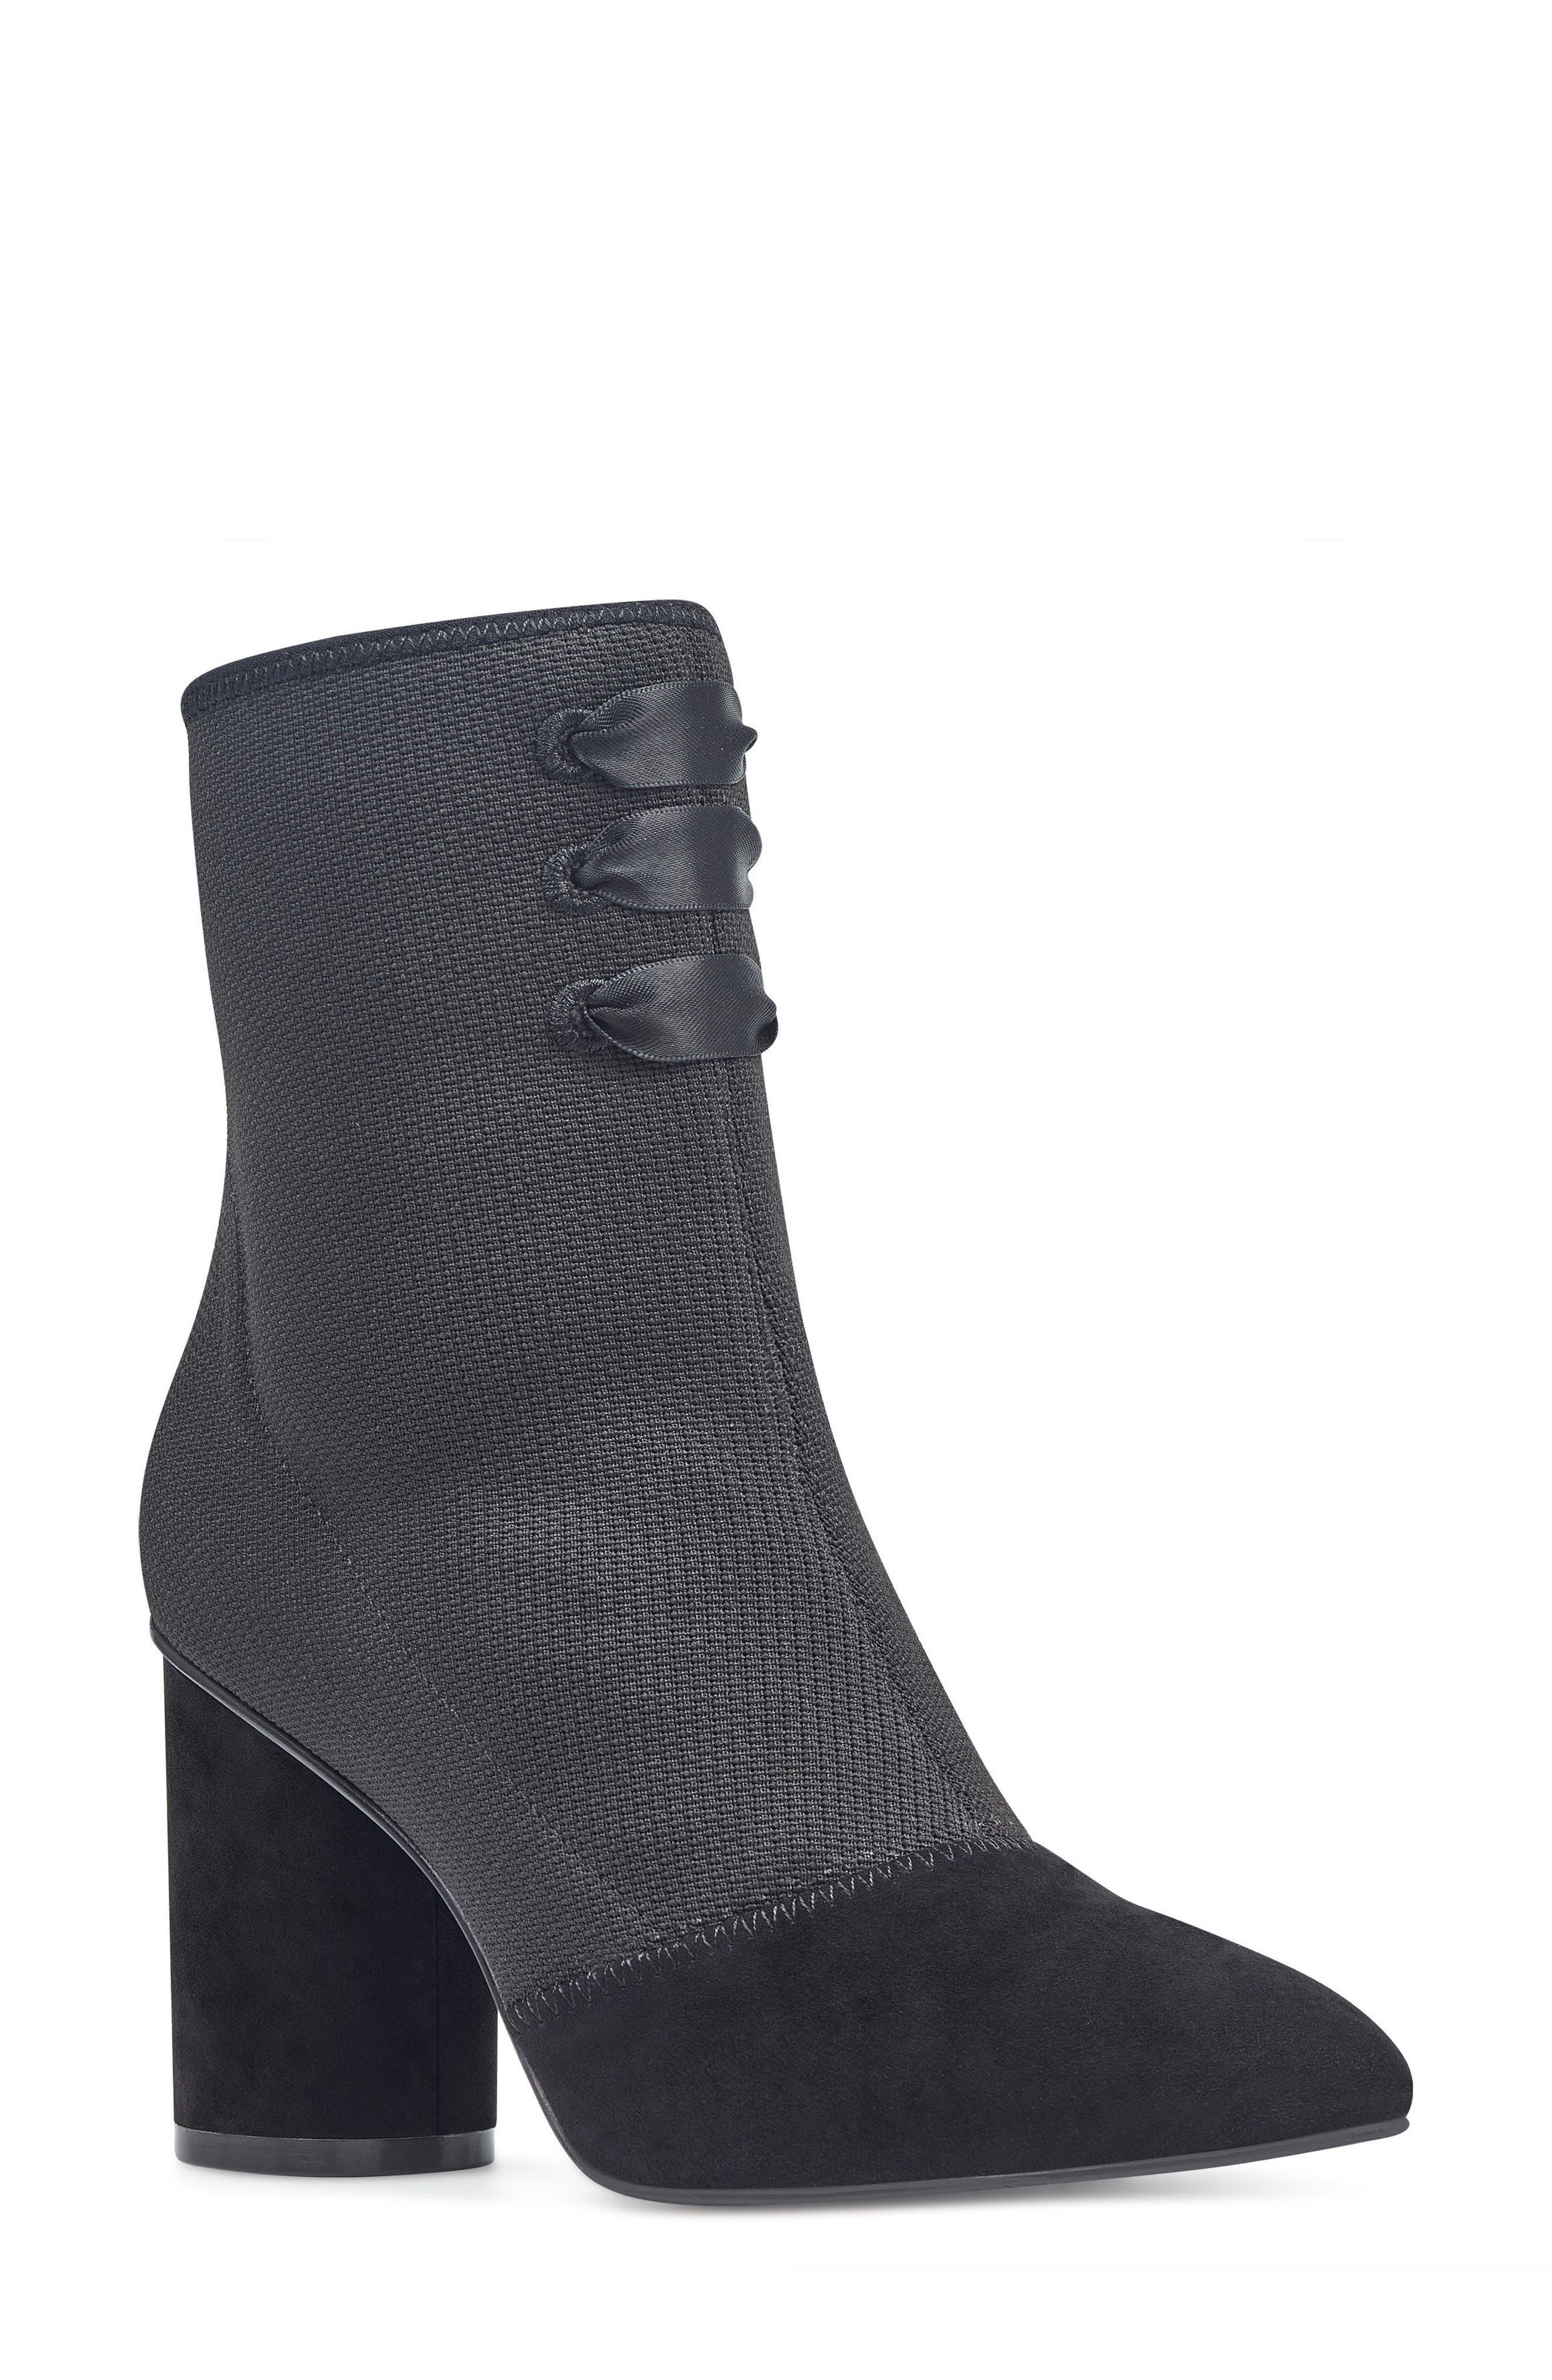 Carolina Pointy Toe Bootie,                             Main thumbnail 1, color,                             Black Multi Fabric